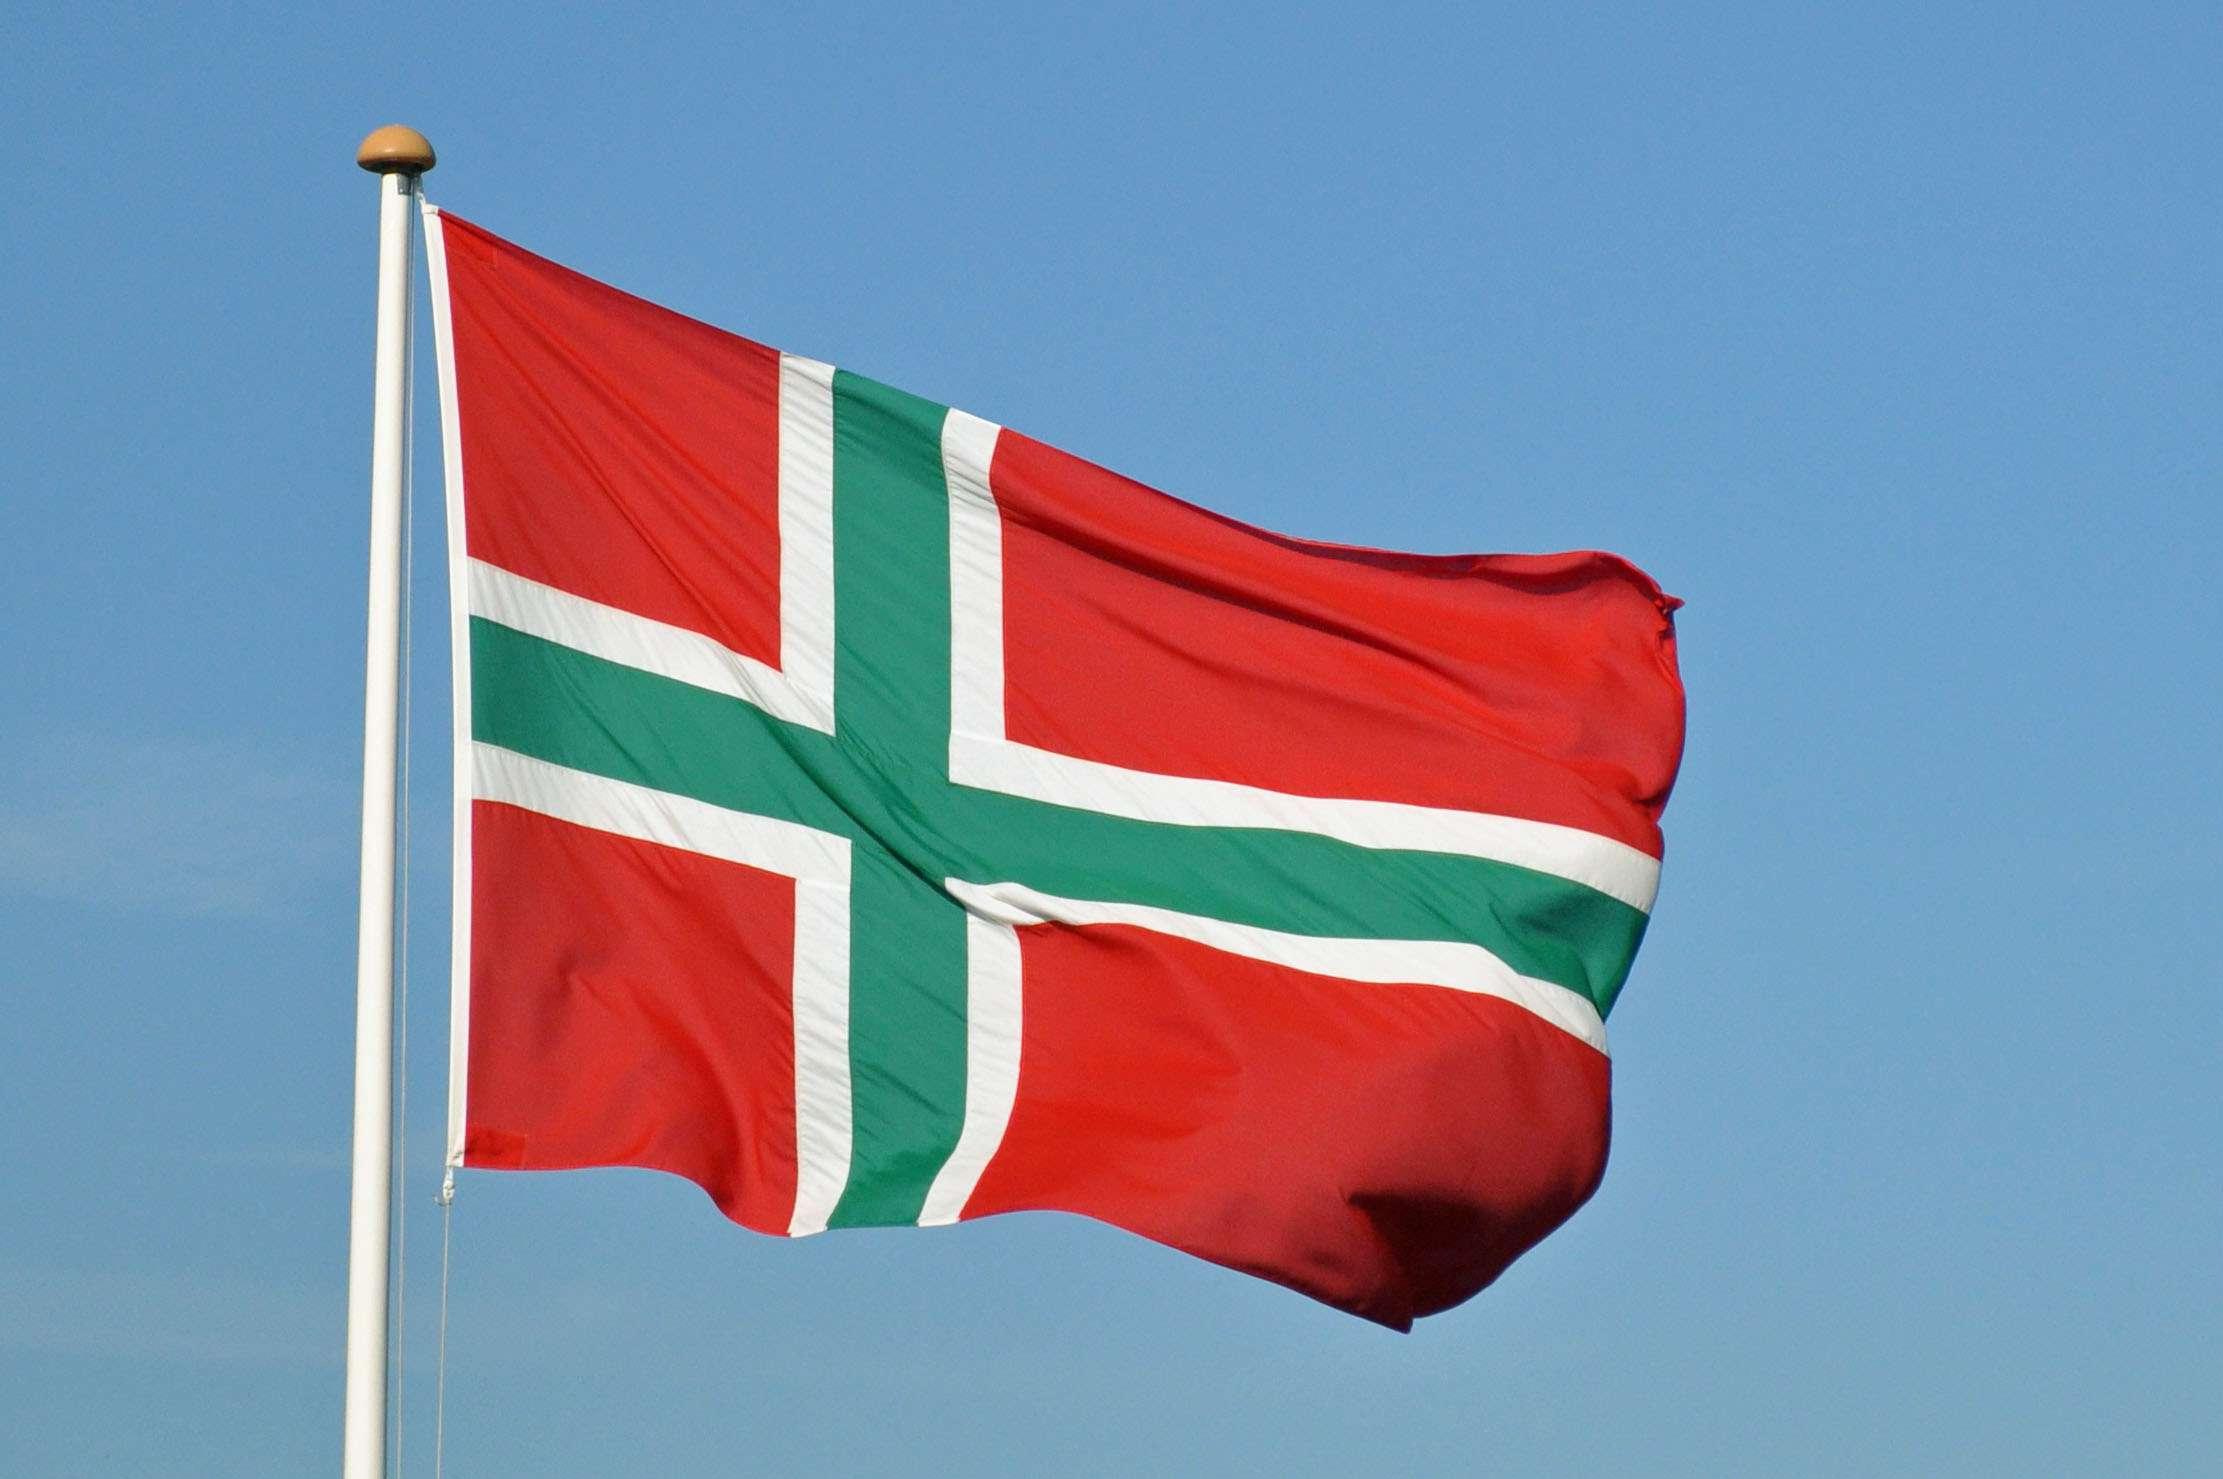 Bornholm flag